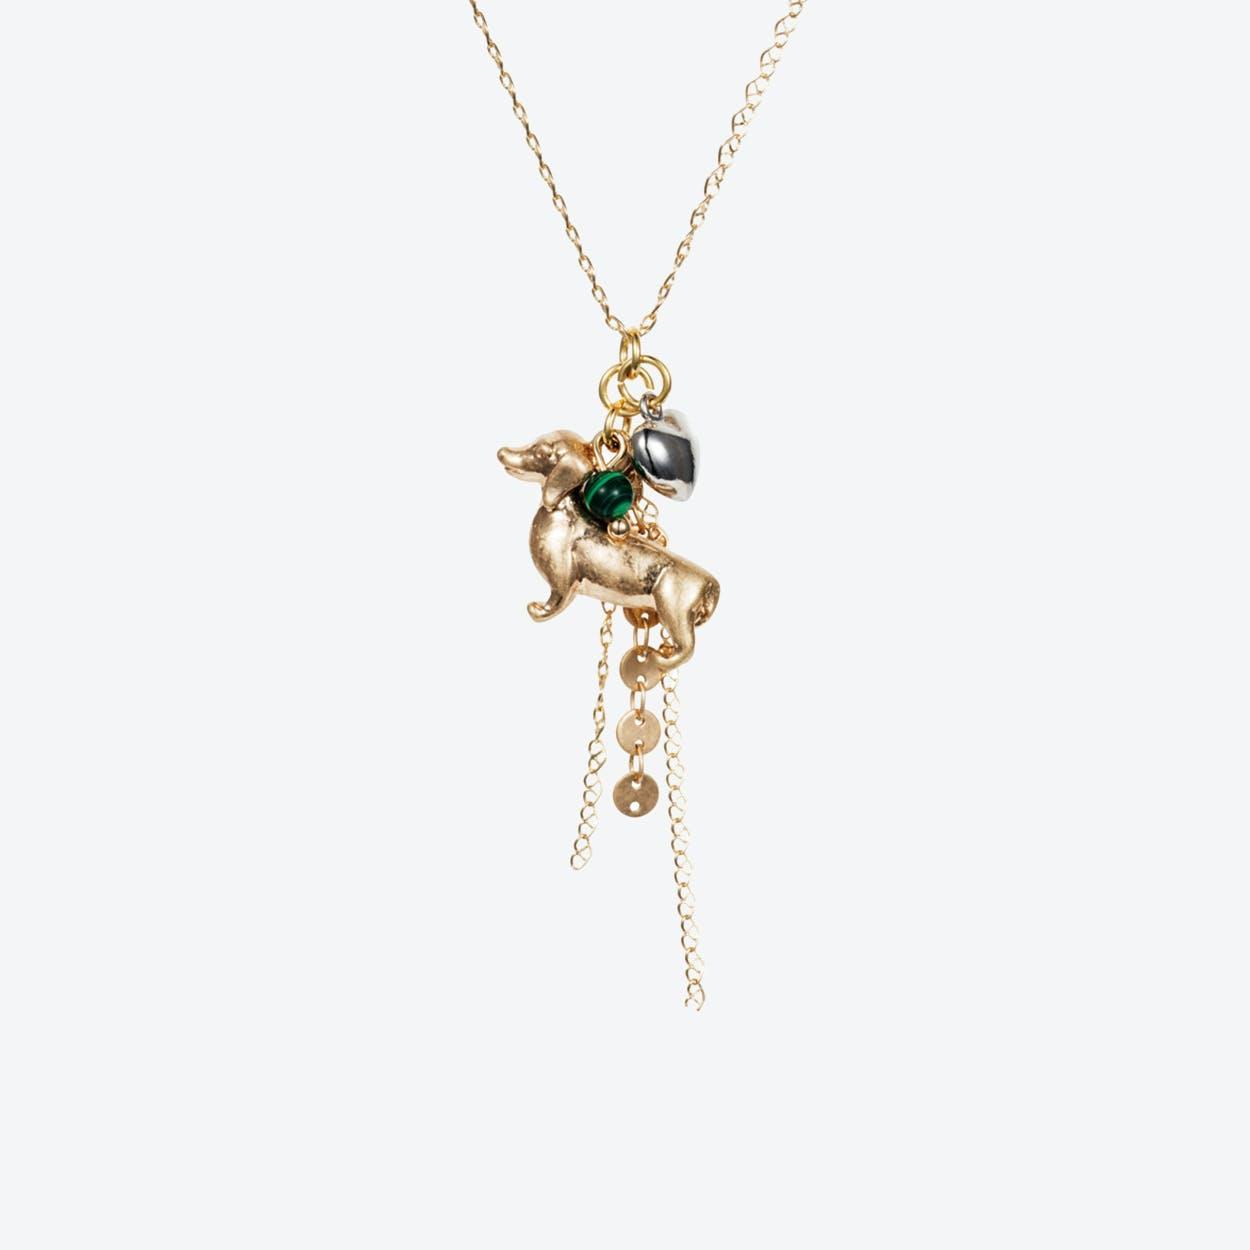 Daschund Charm Necklace – Gold with Malachite & Silver Heart